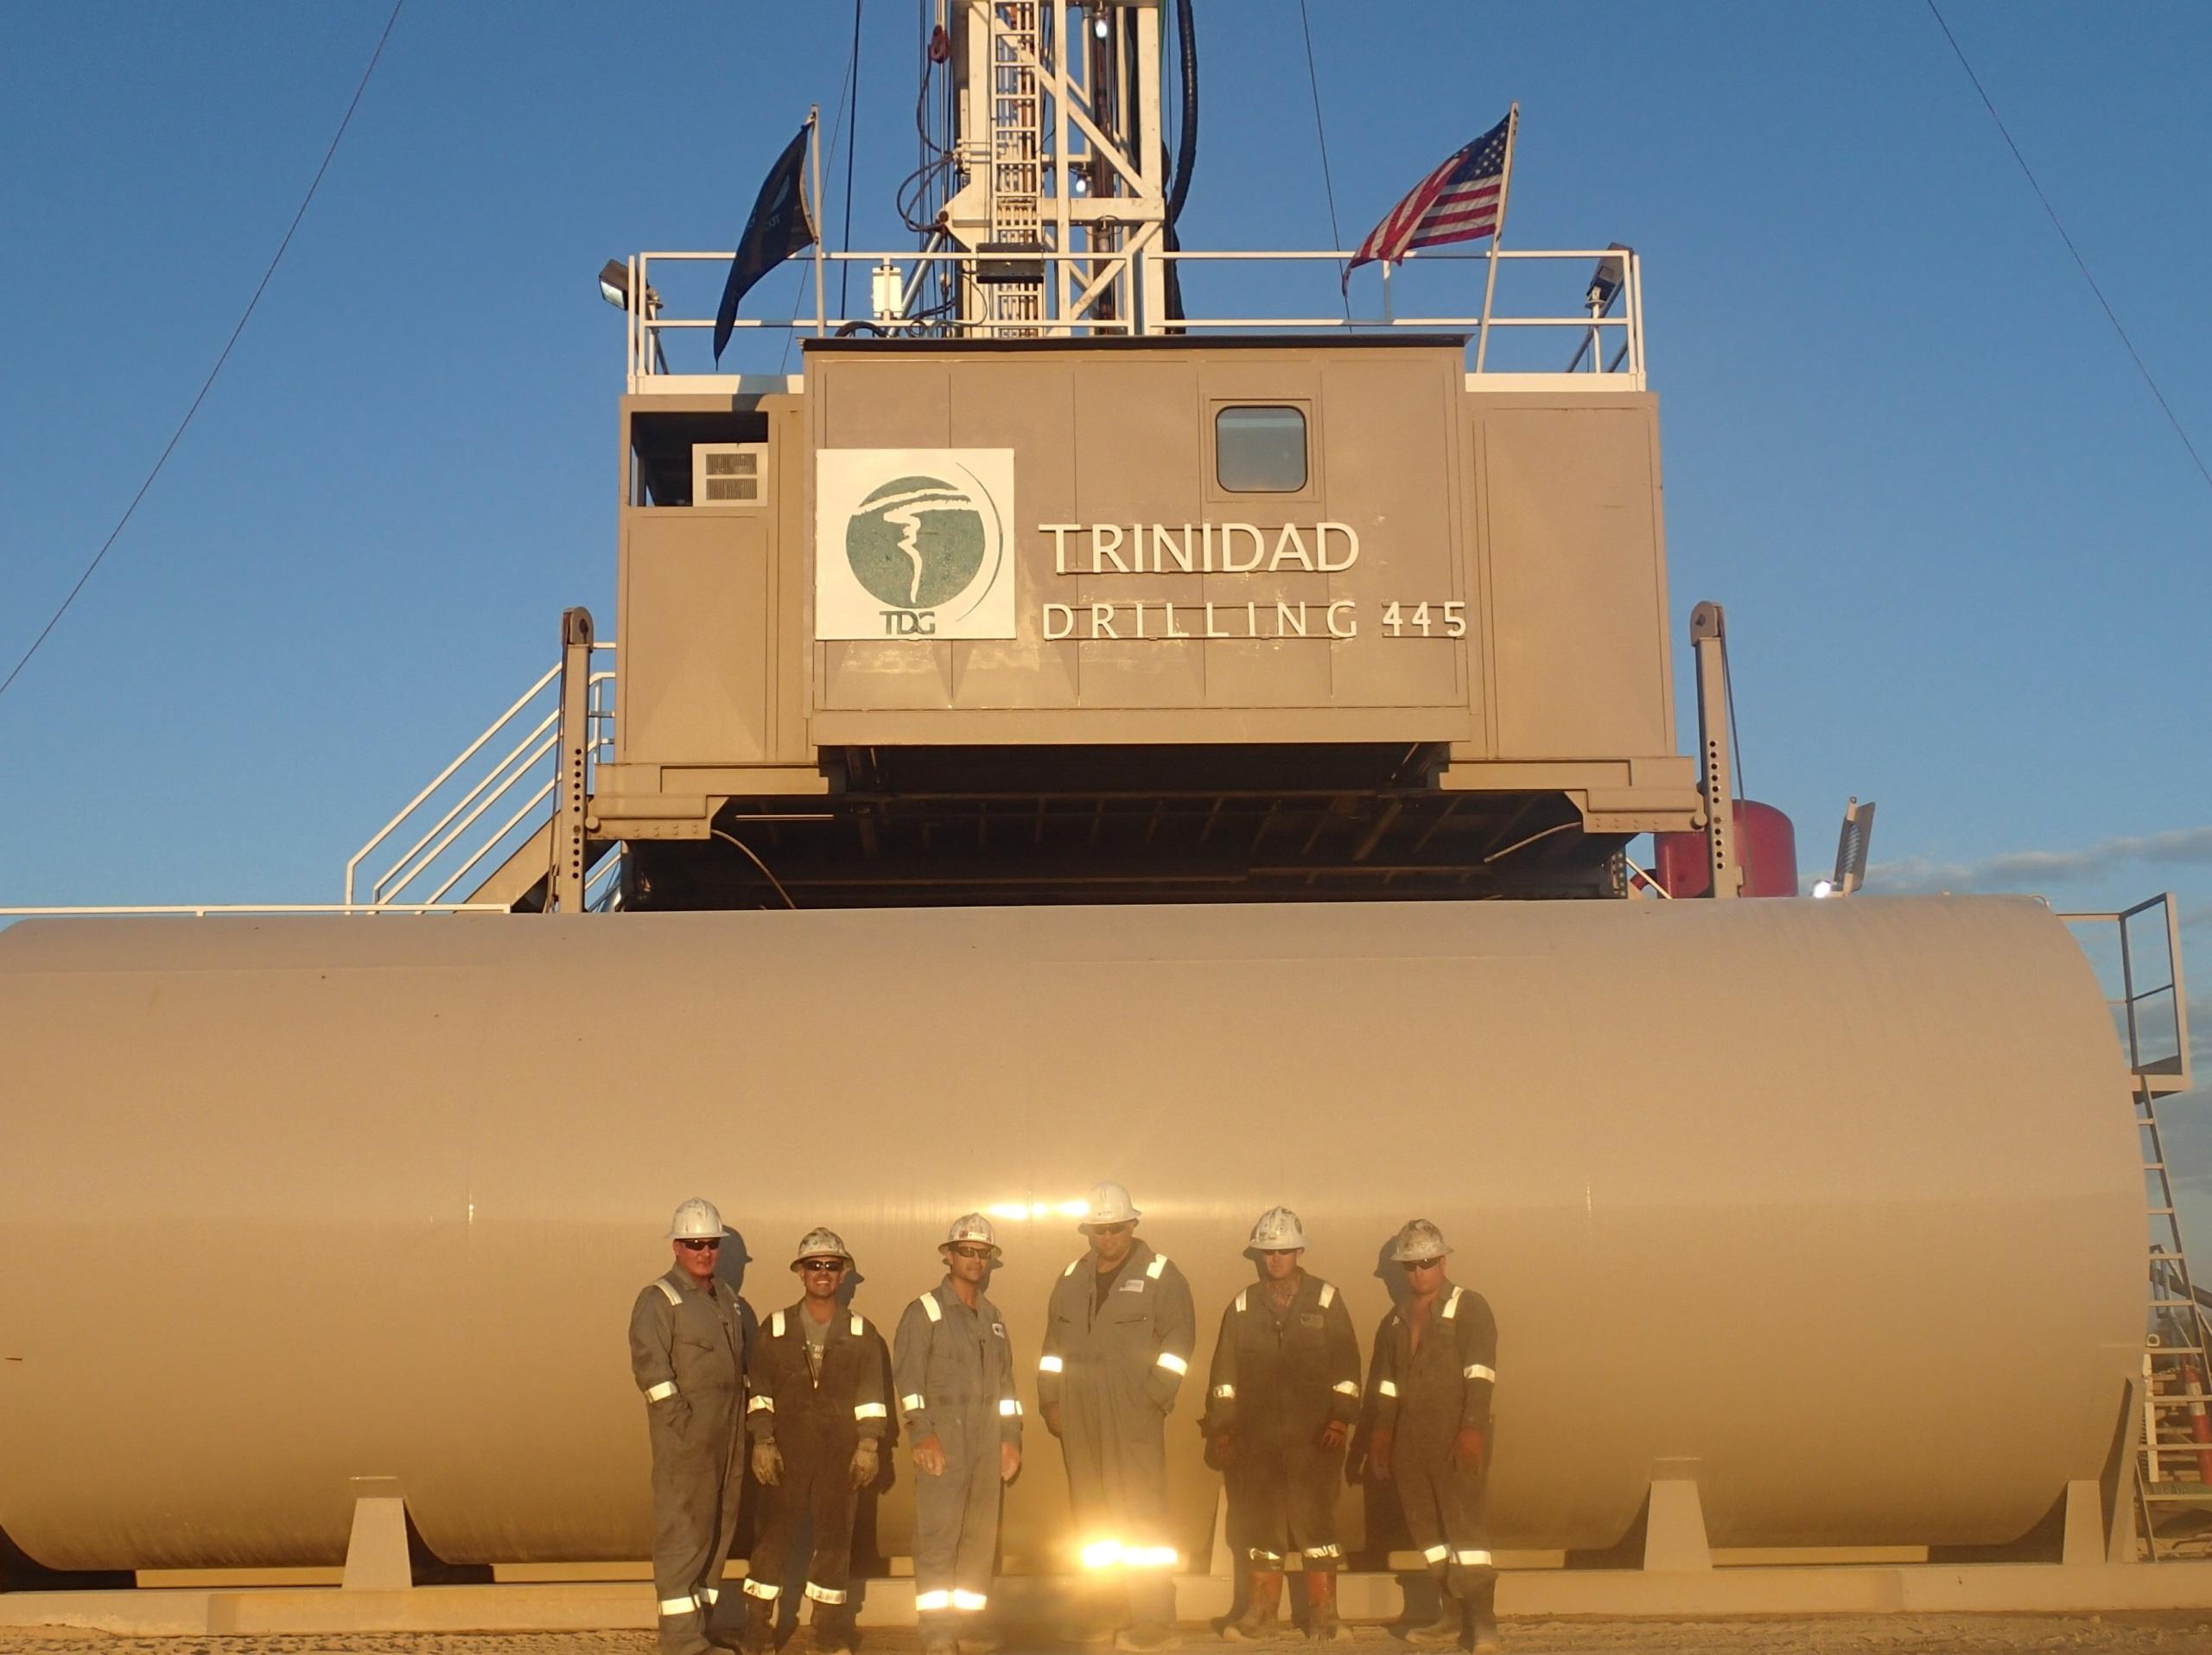 Trinidad Drilling Rig 445 and crew